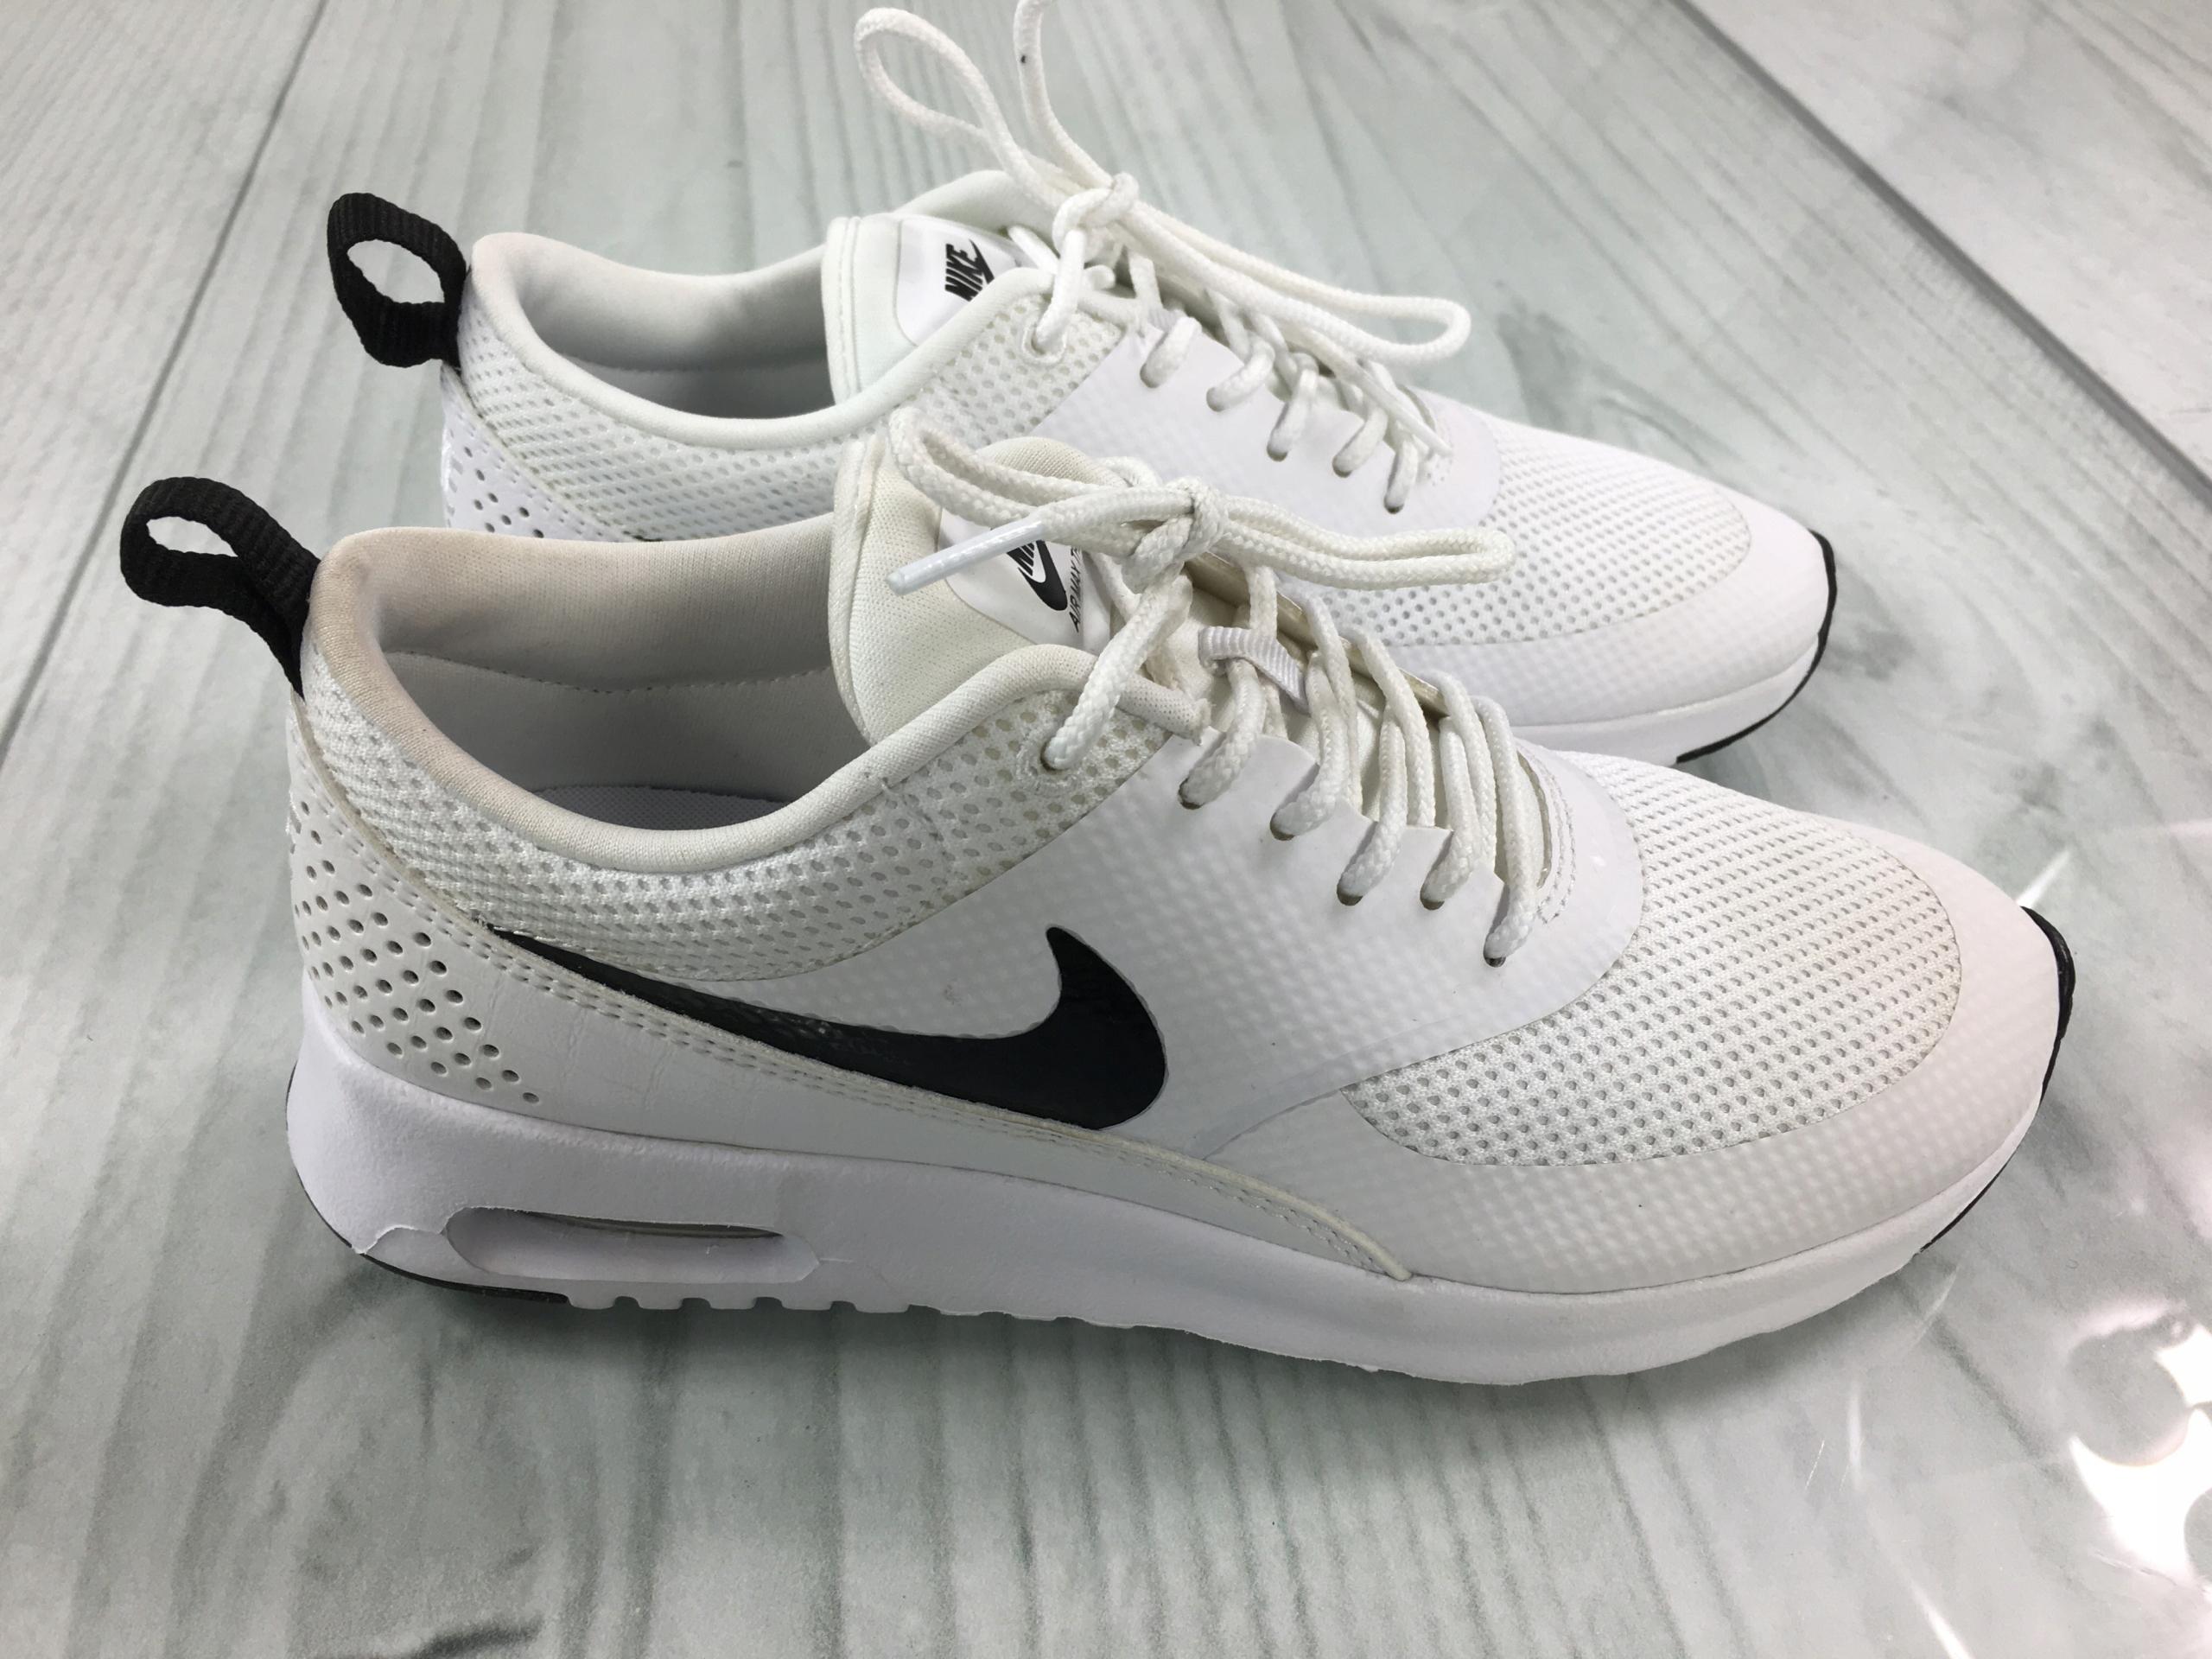 A031H11 Nike AIR MAX 97 SREBRNO ZŁOTE BUTY 40